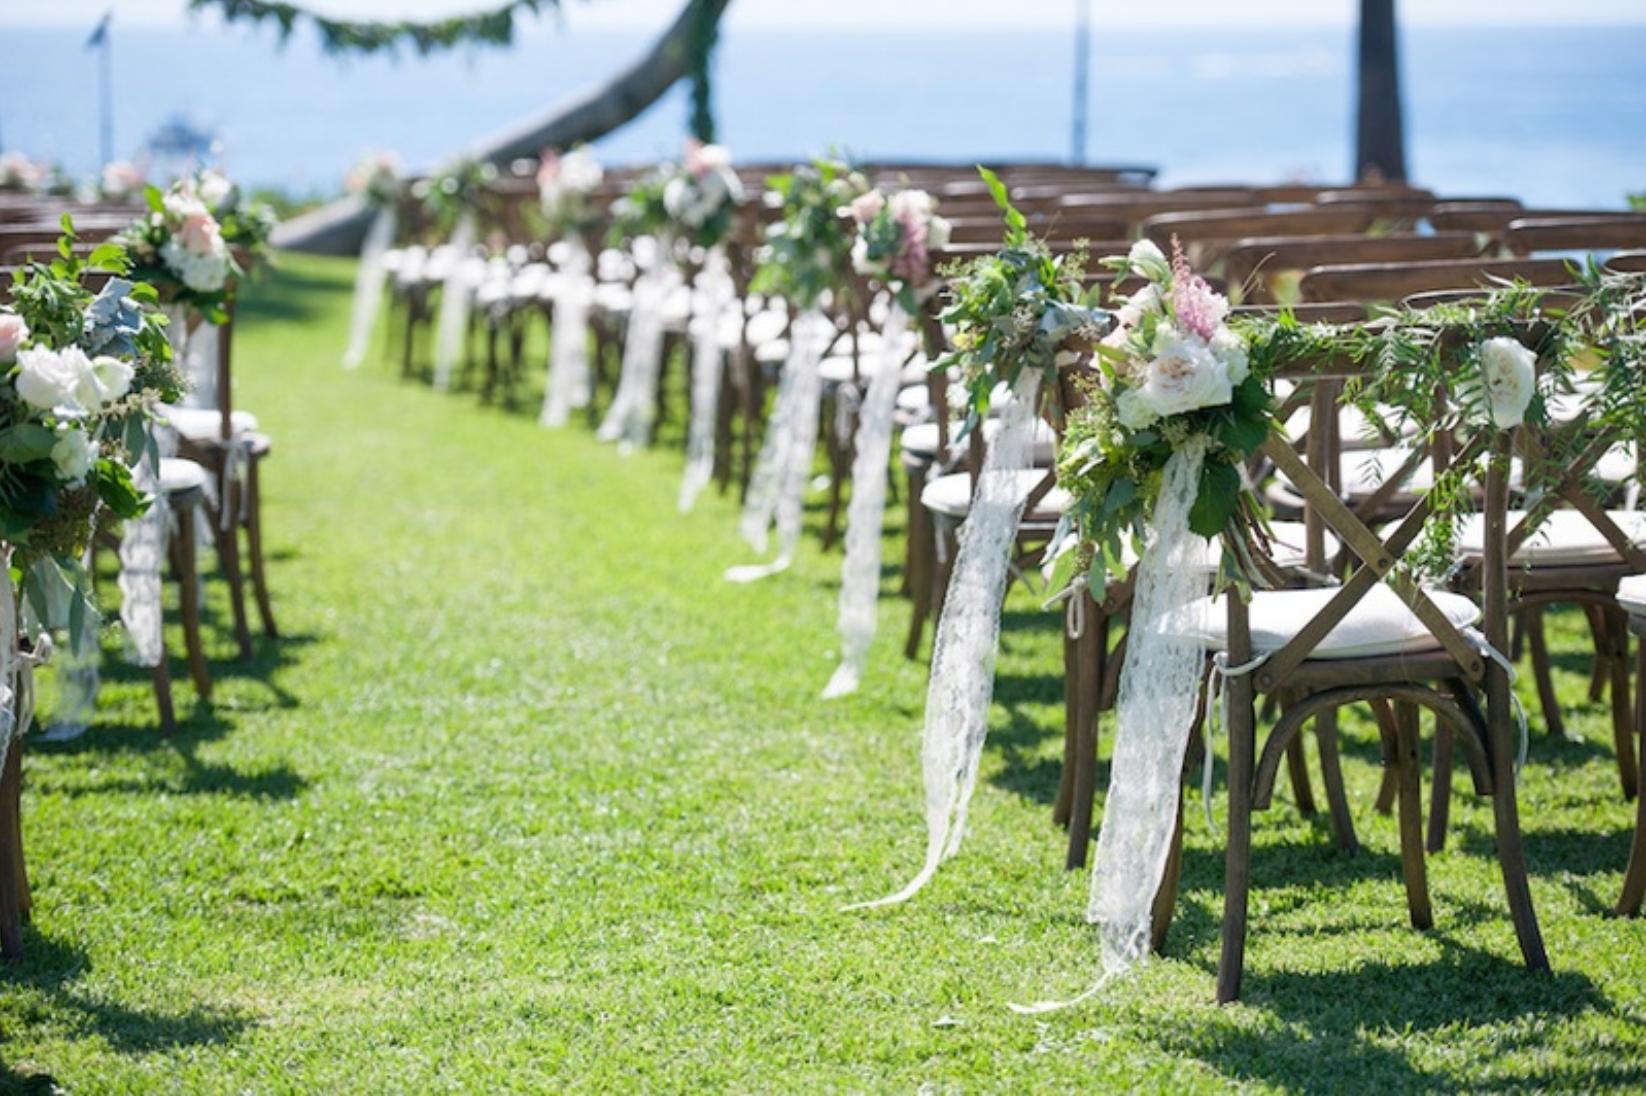 Vintage Beach Wedding Ceremony: Ceremonies & Cabanas